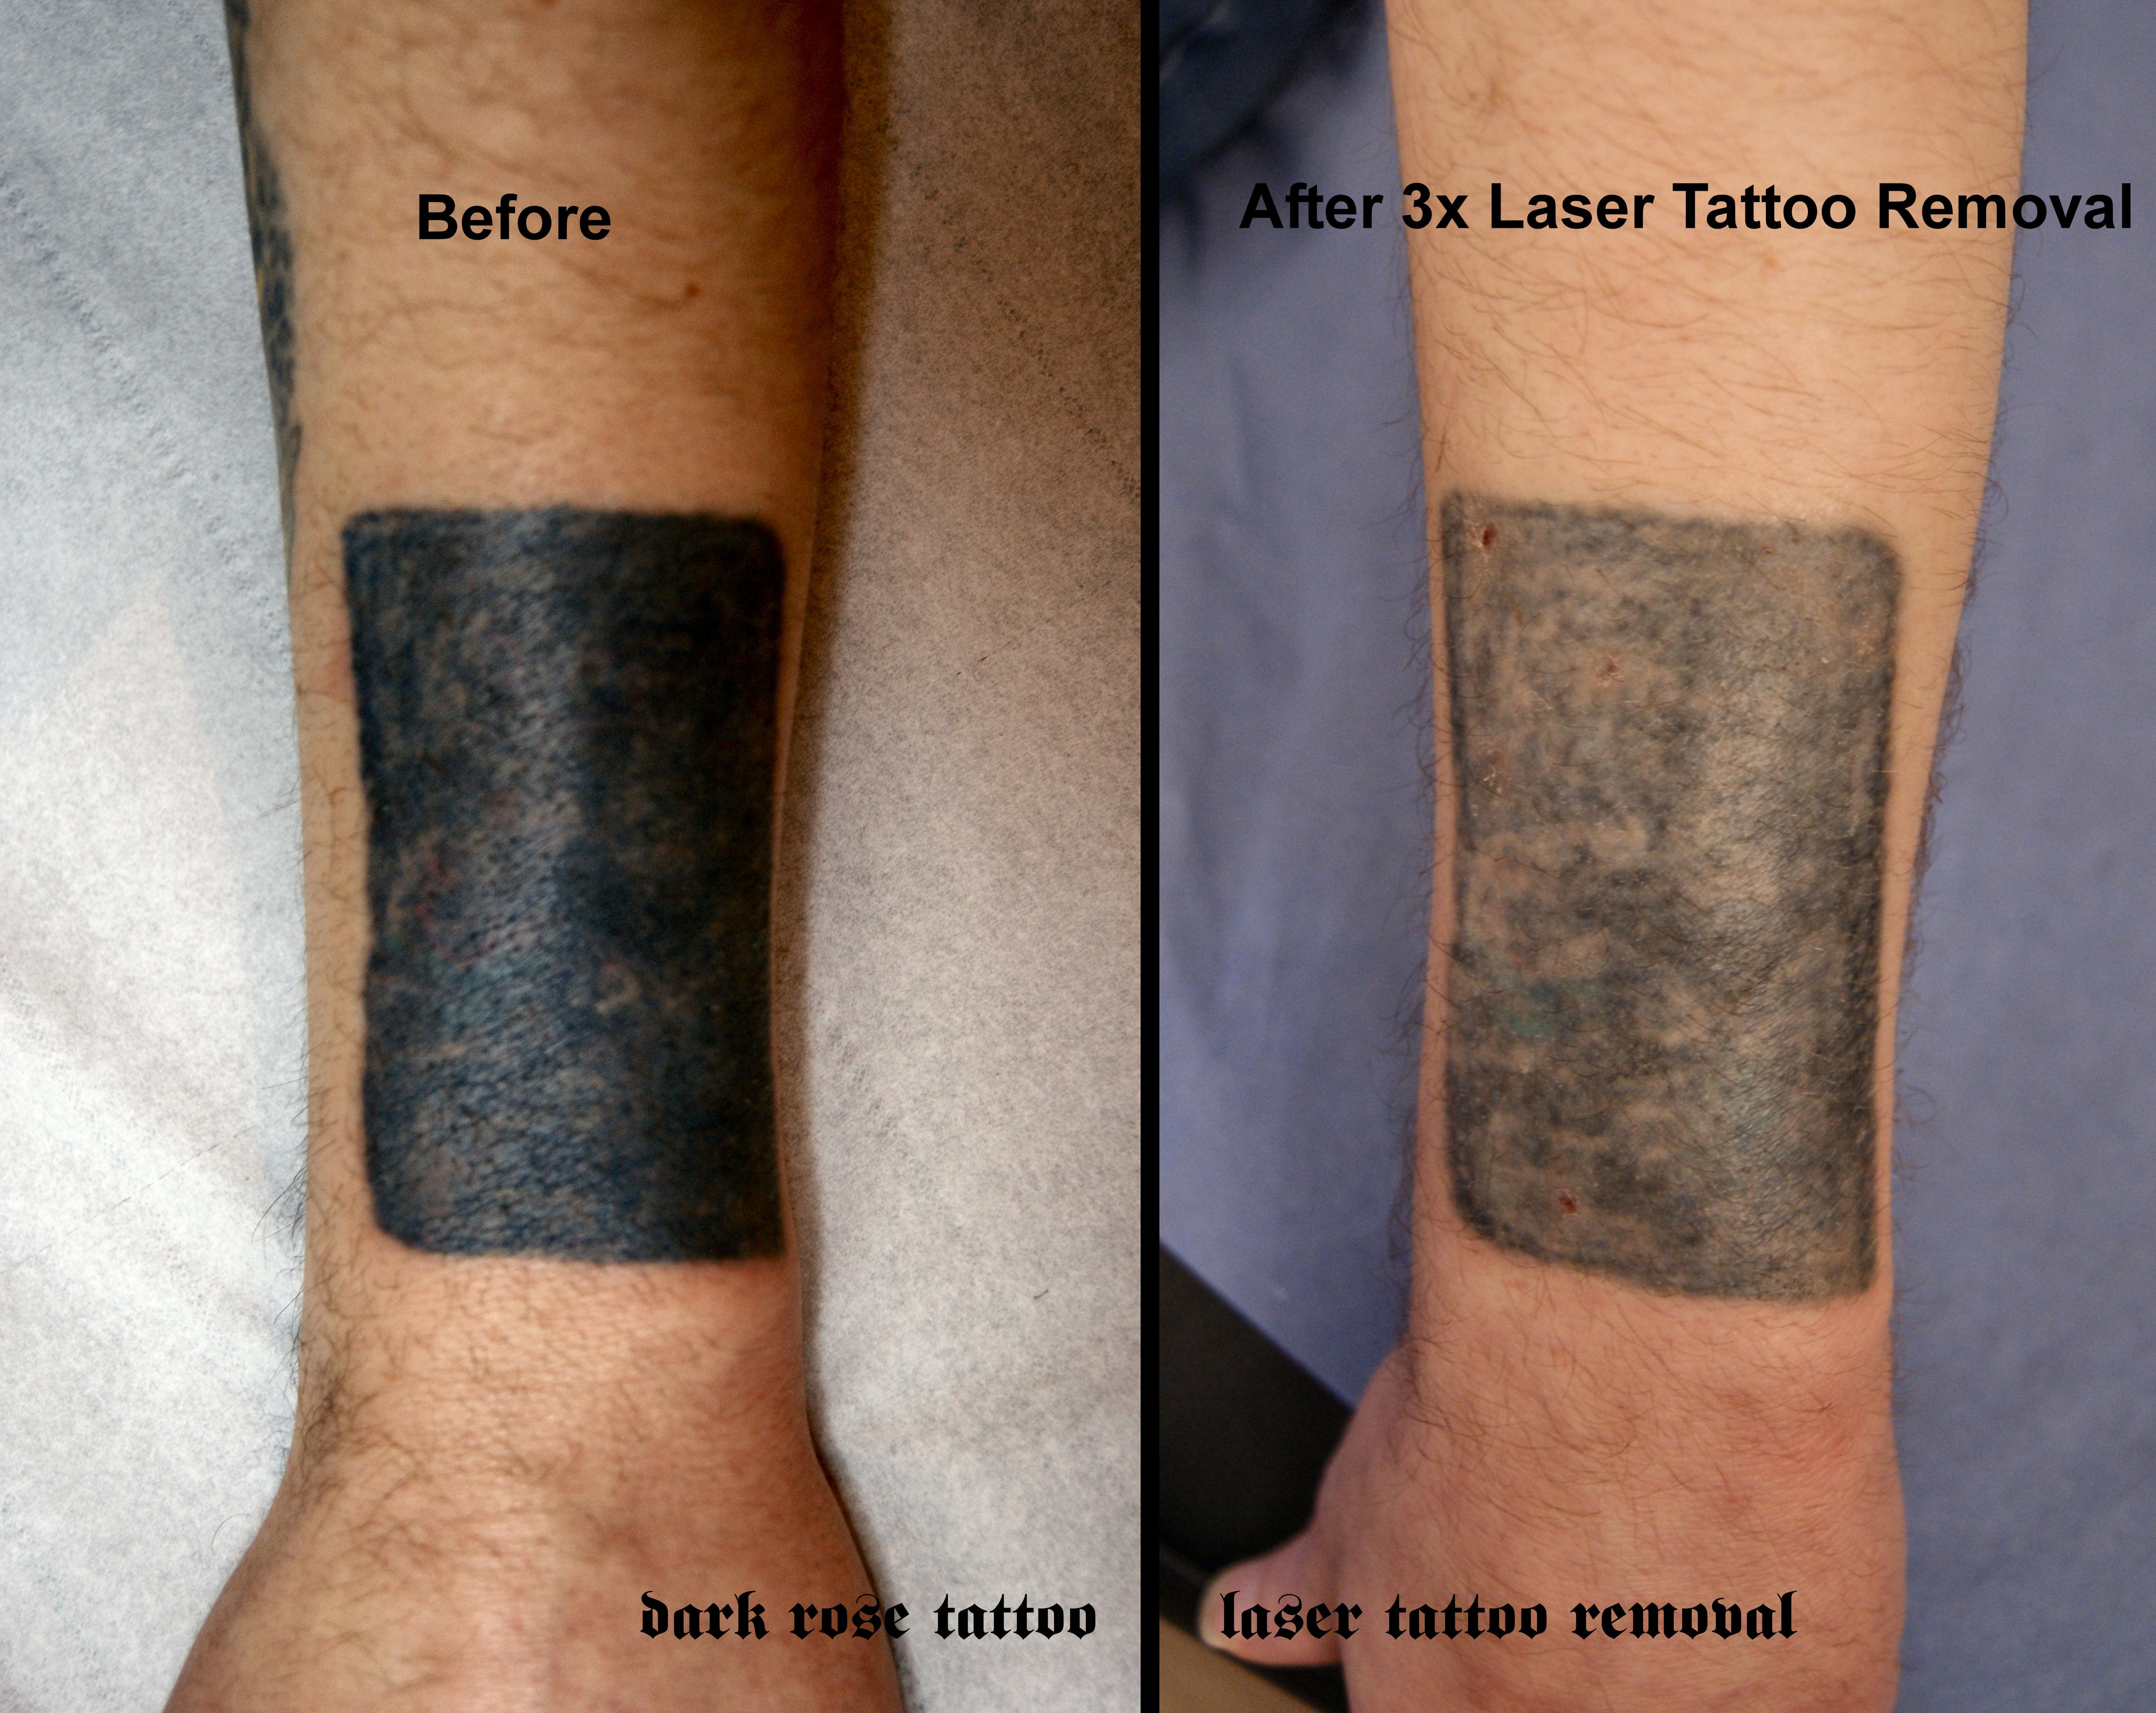 Tattoo And Pmu Removal With Laser Dark Rose Tattoo